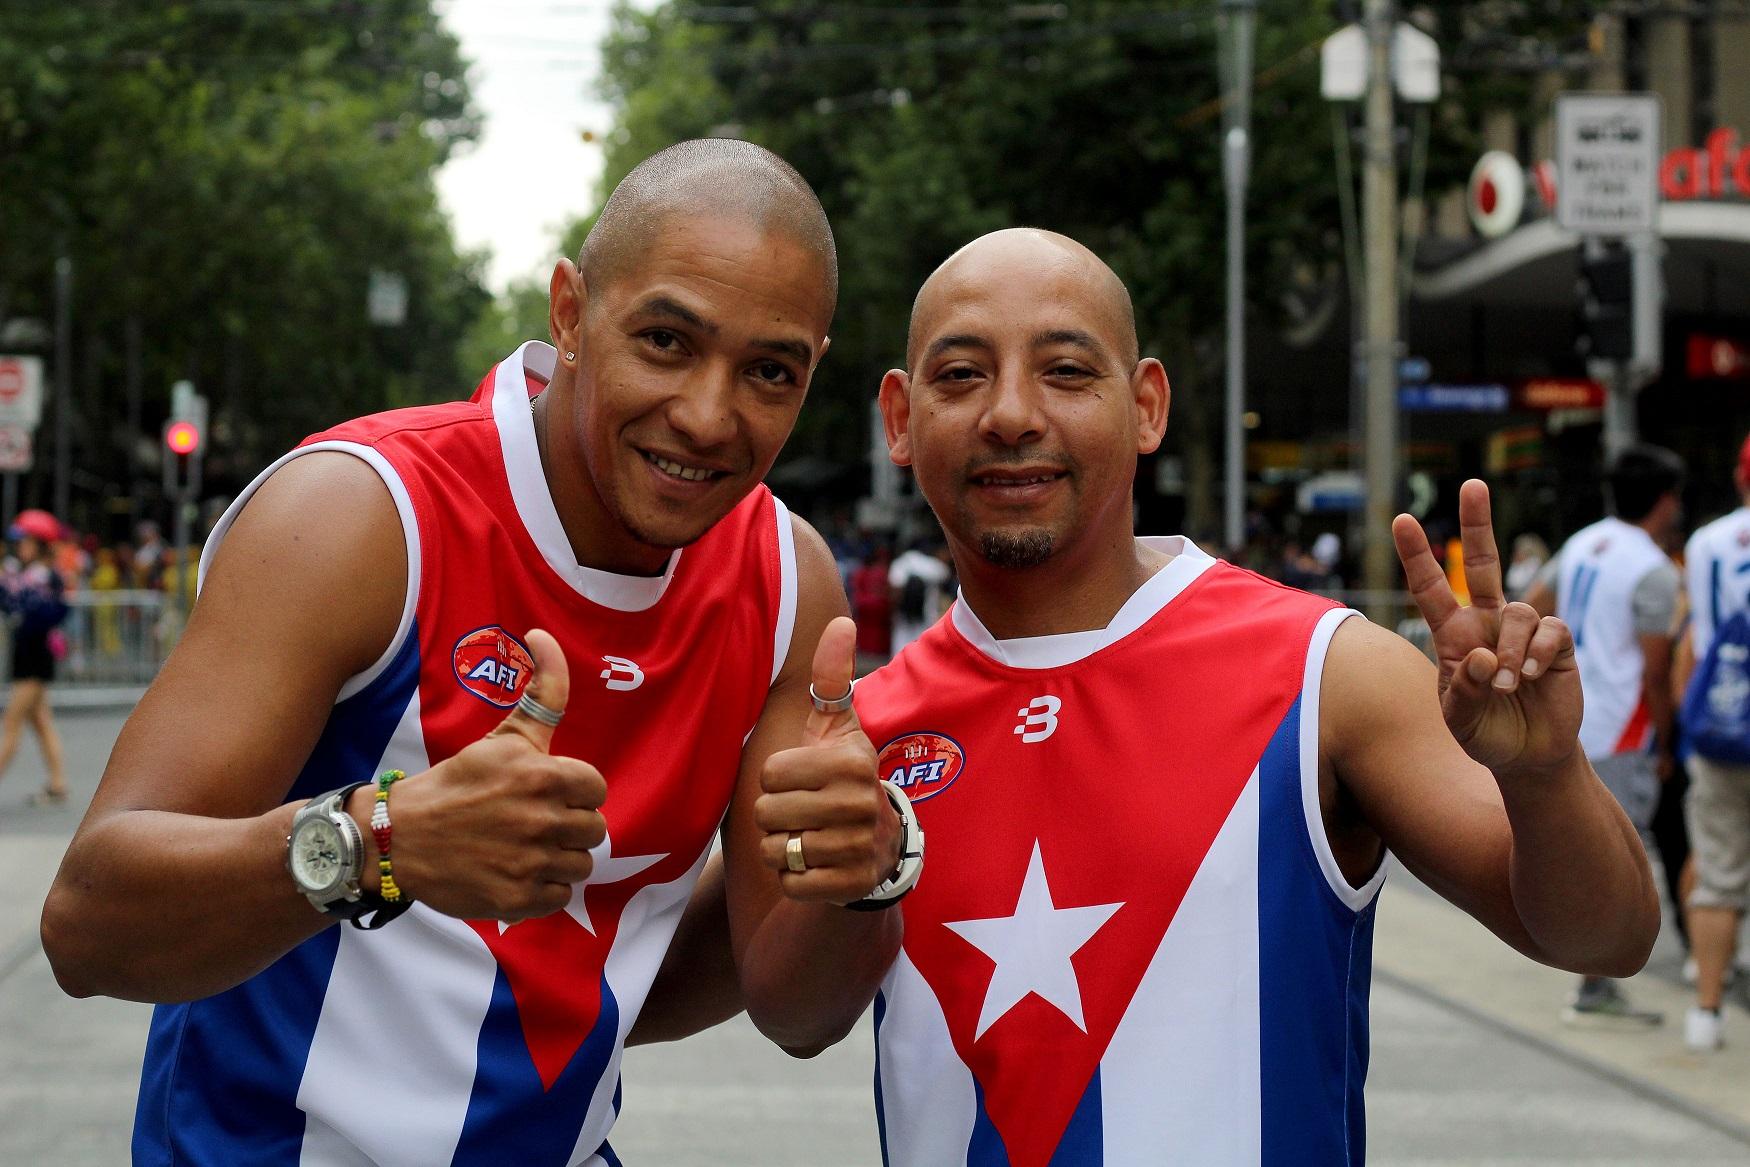 AFI Cuba AFL footy